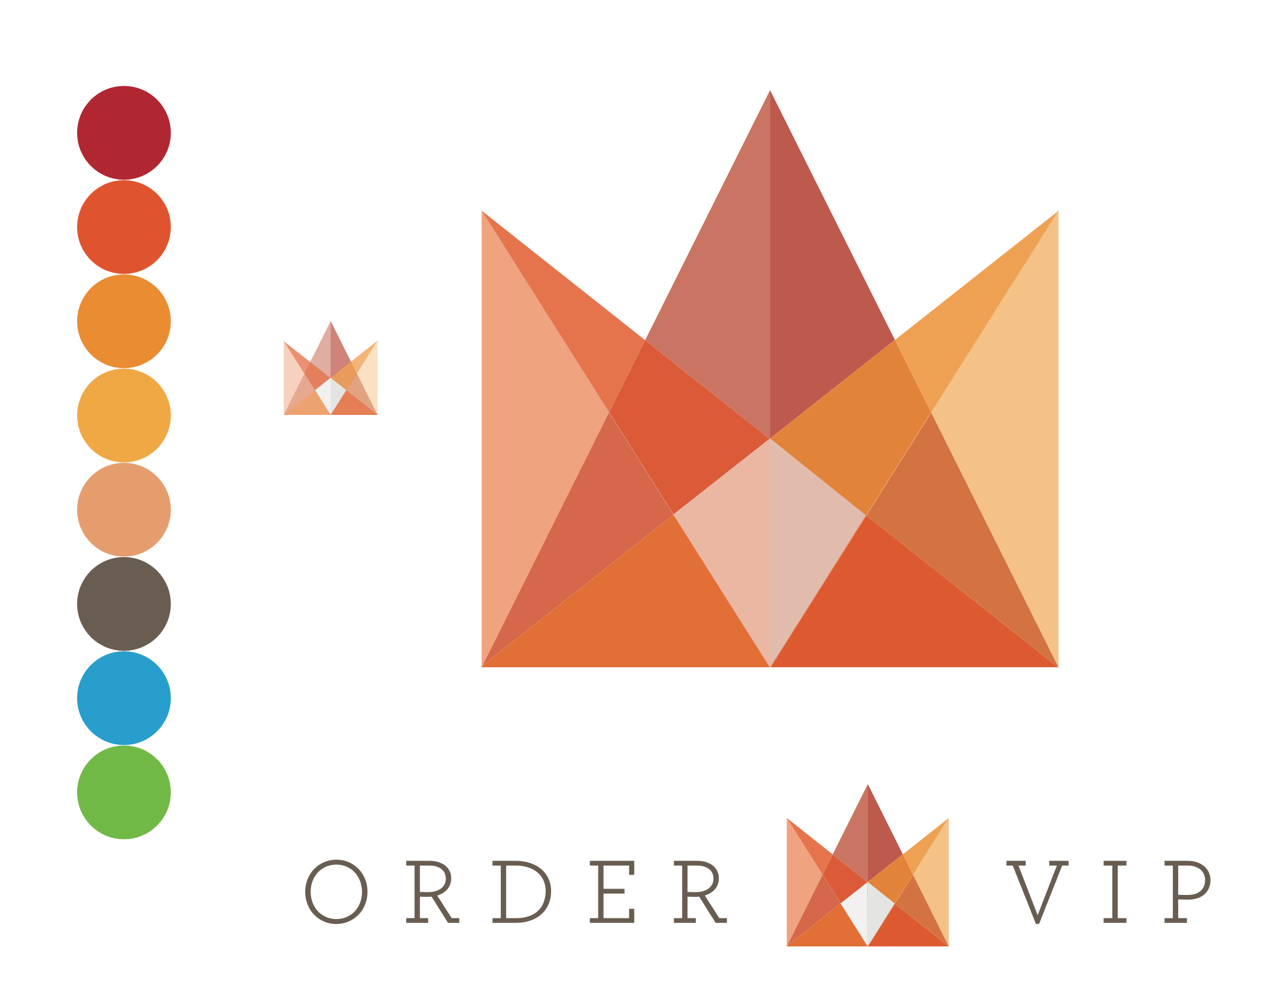 OrderVIP, Branding & Colors